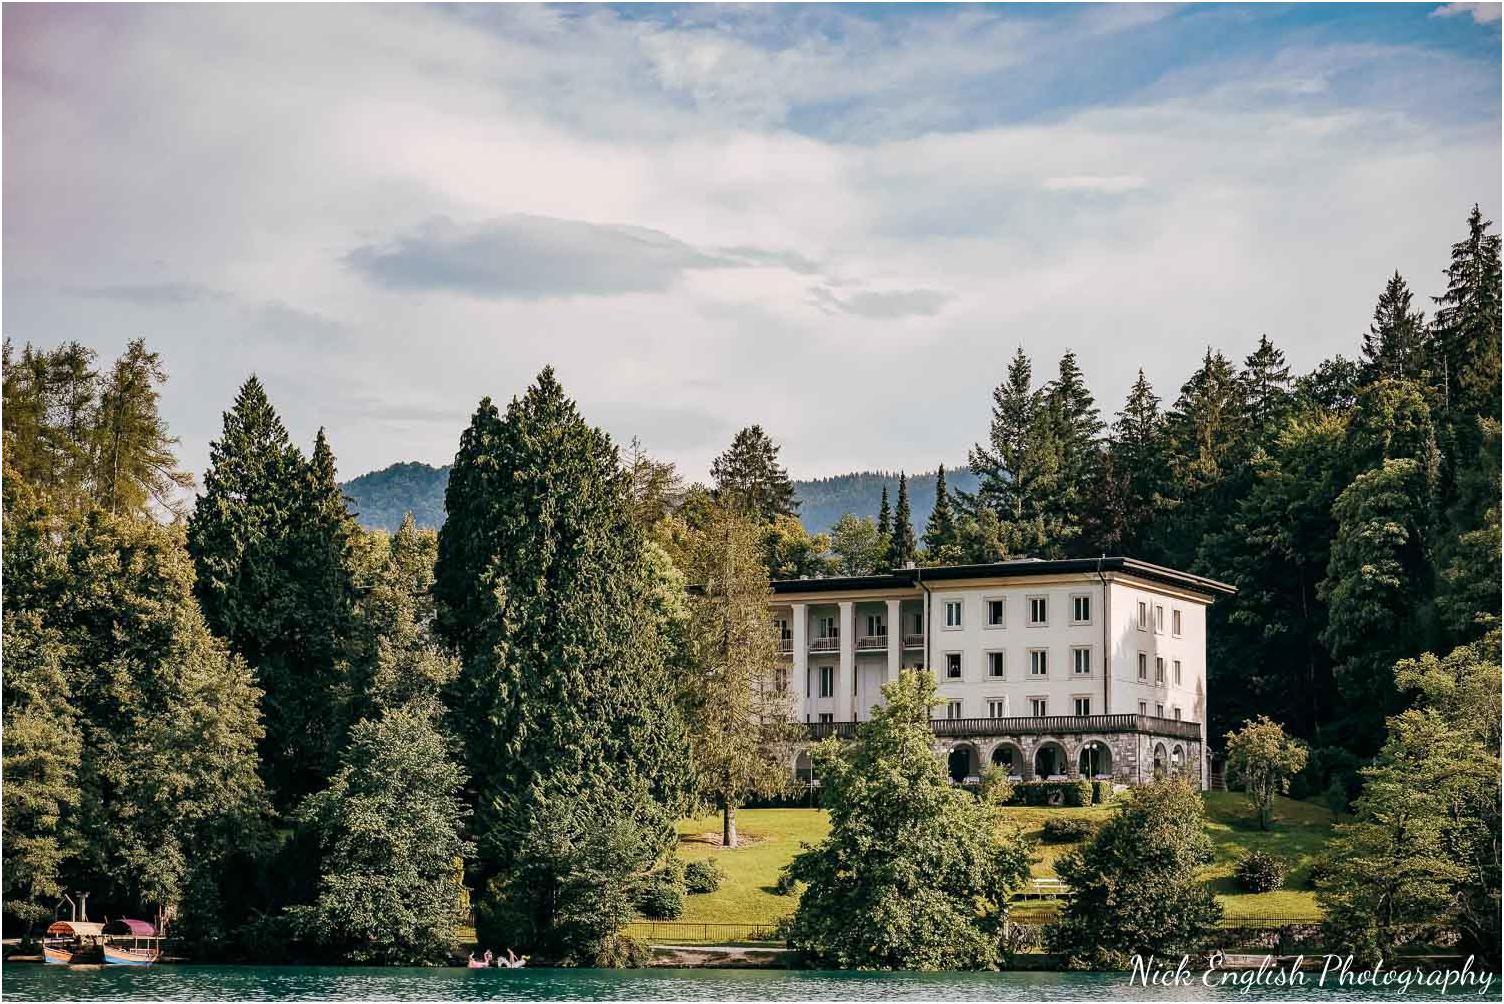 Destination_Wedding_Photographer_Slovenia_Nick_English_Photography-70-8.jpg